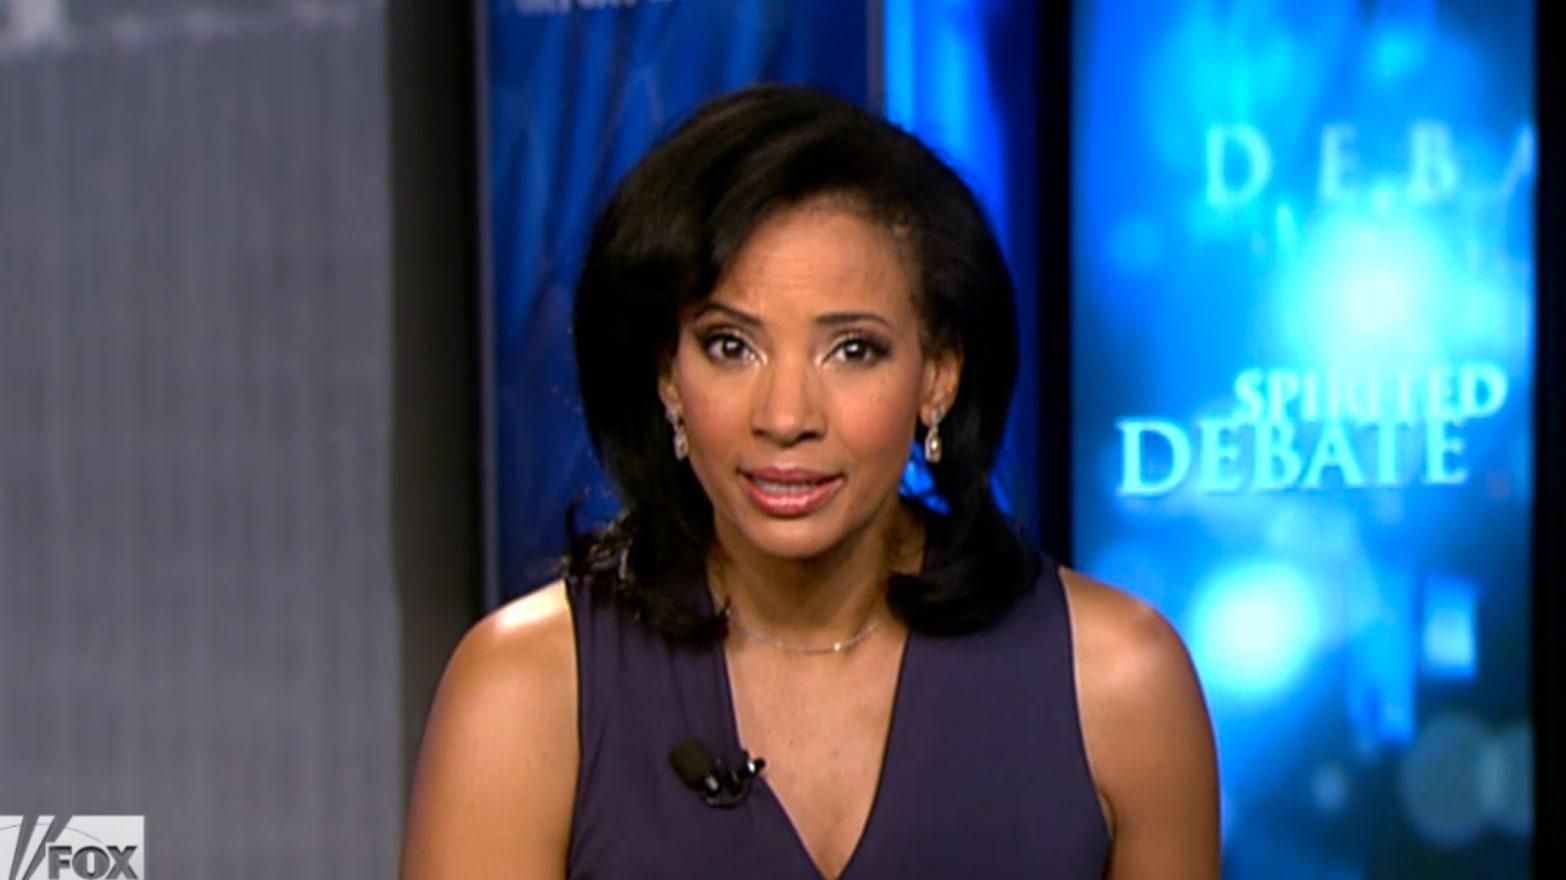 Lauren Green, the Woman Behind Fox News' Reza Aslan